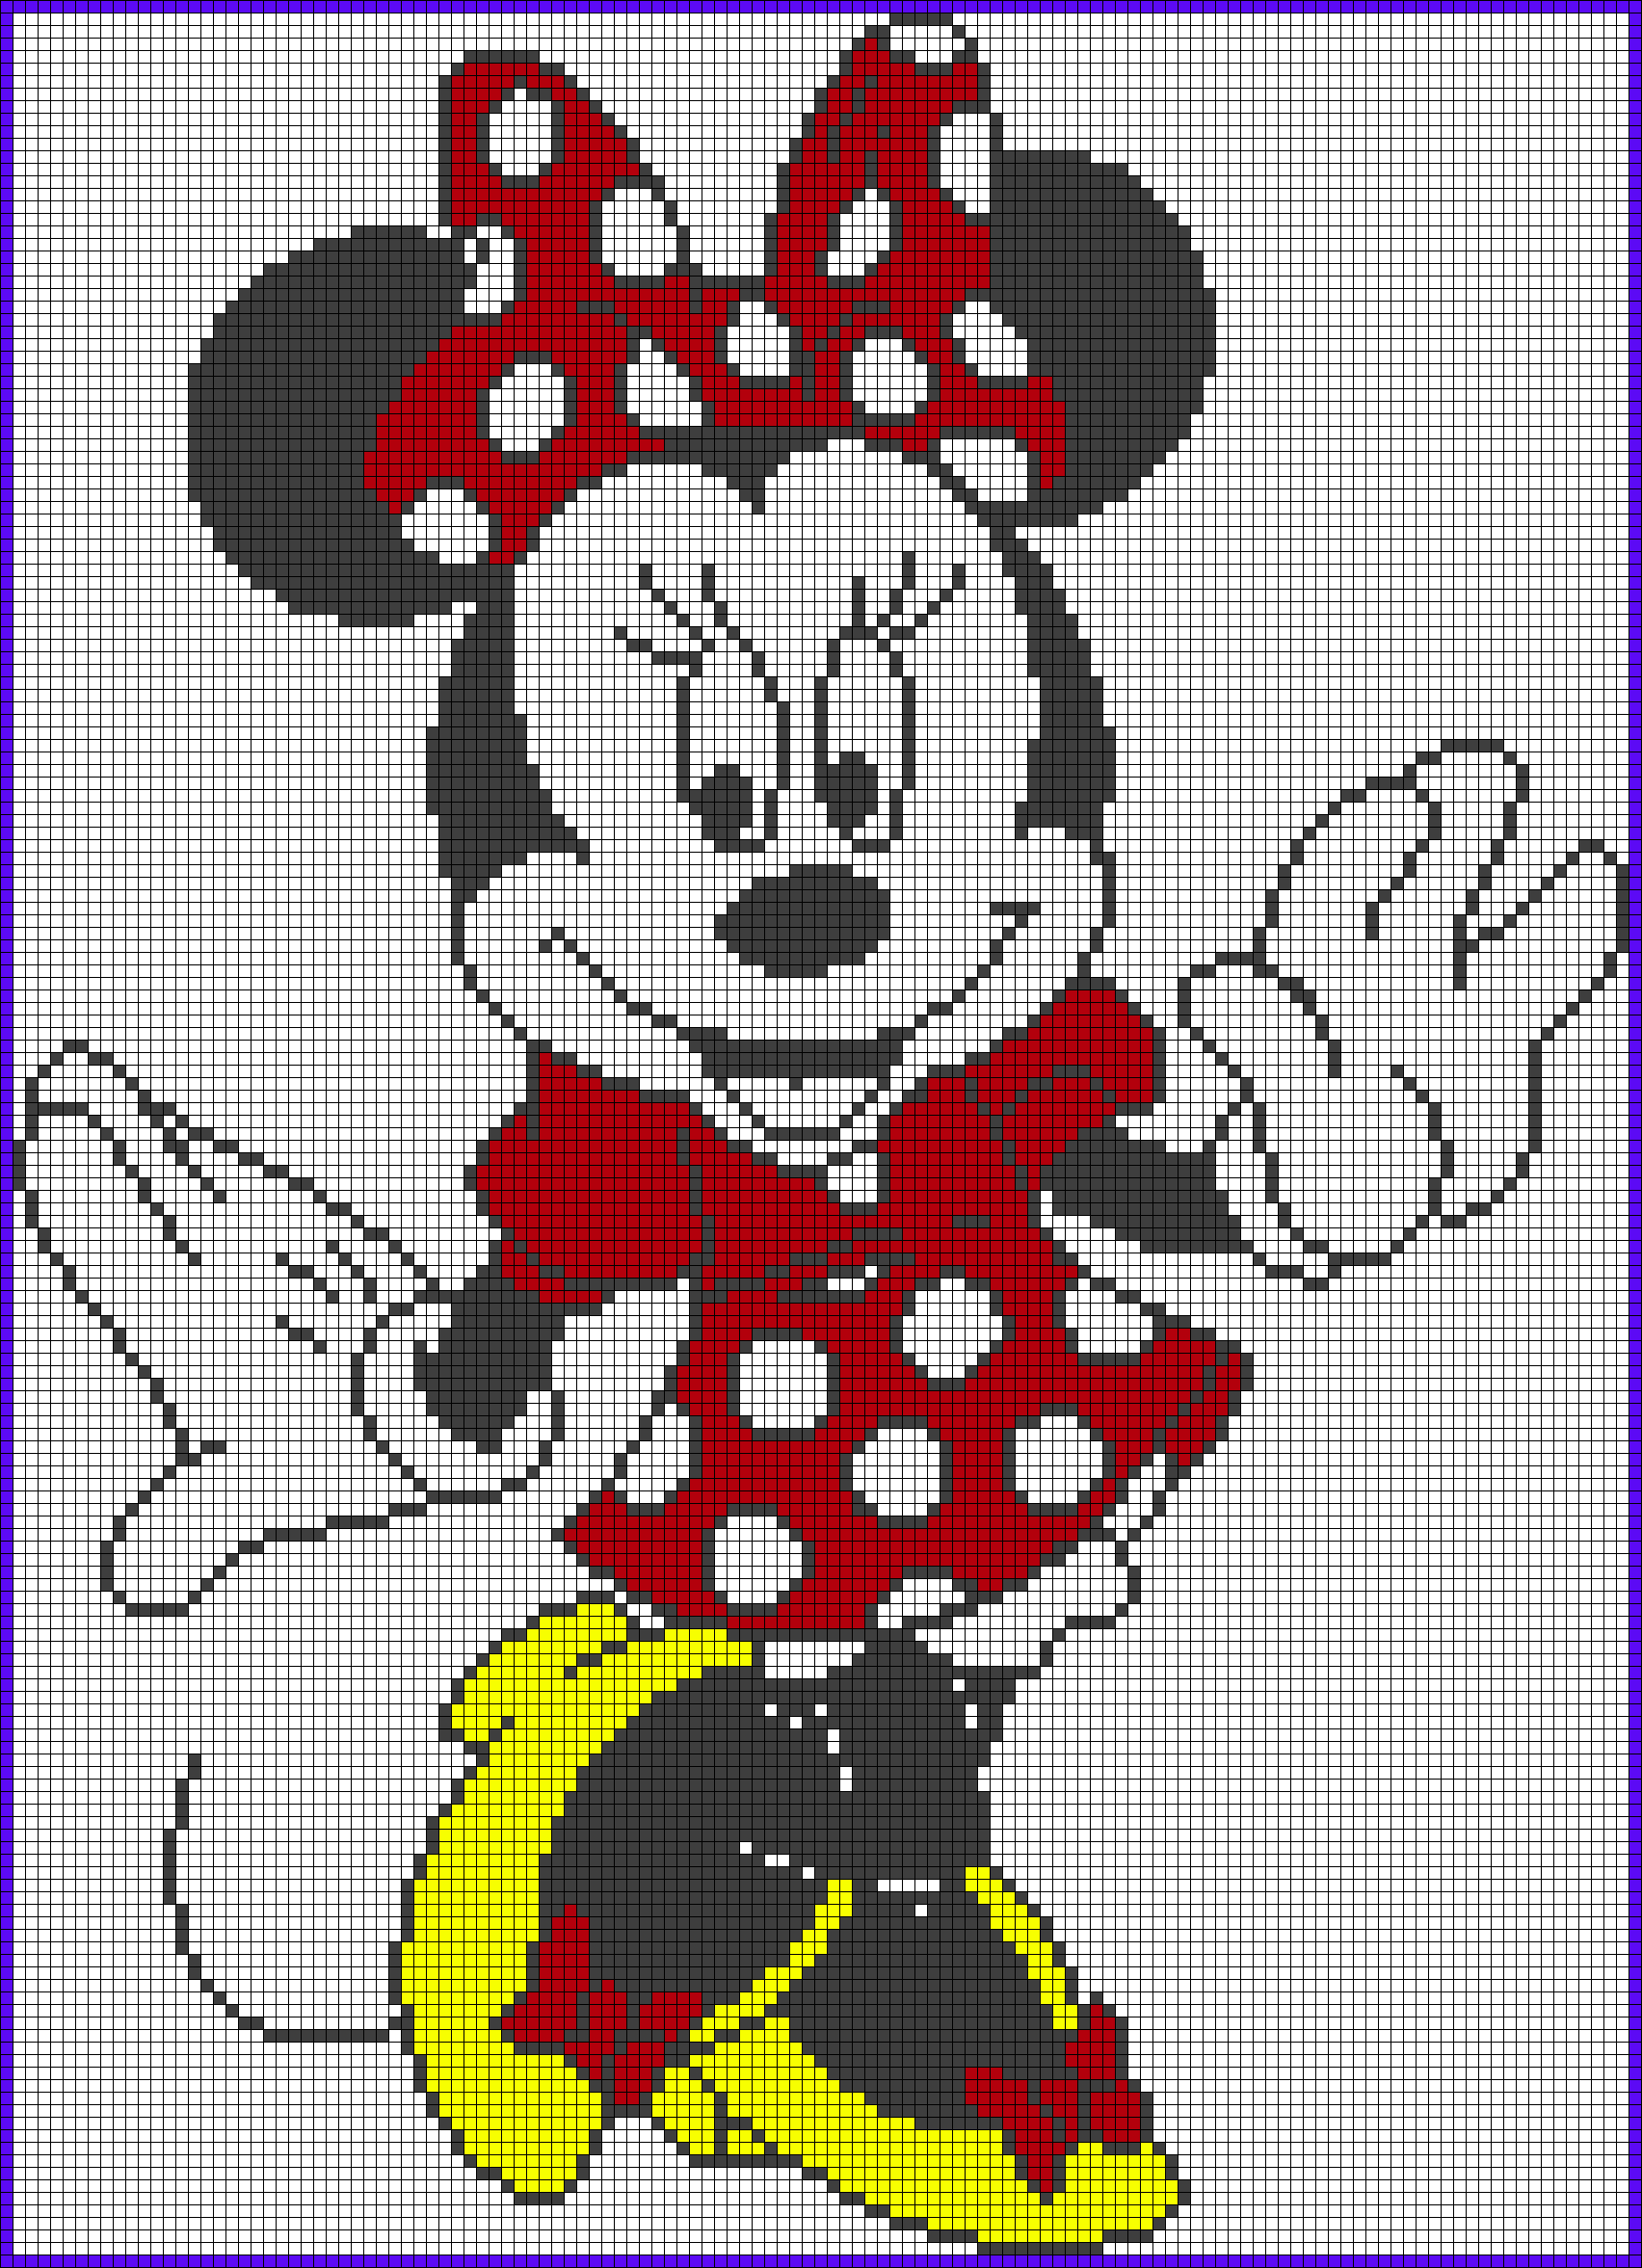 Minnie Mouse Perler Bead Pattern | Disney puntocroce /cross stitch ...